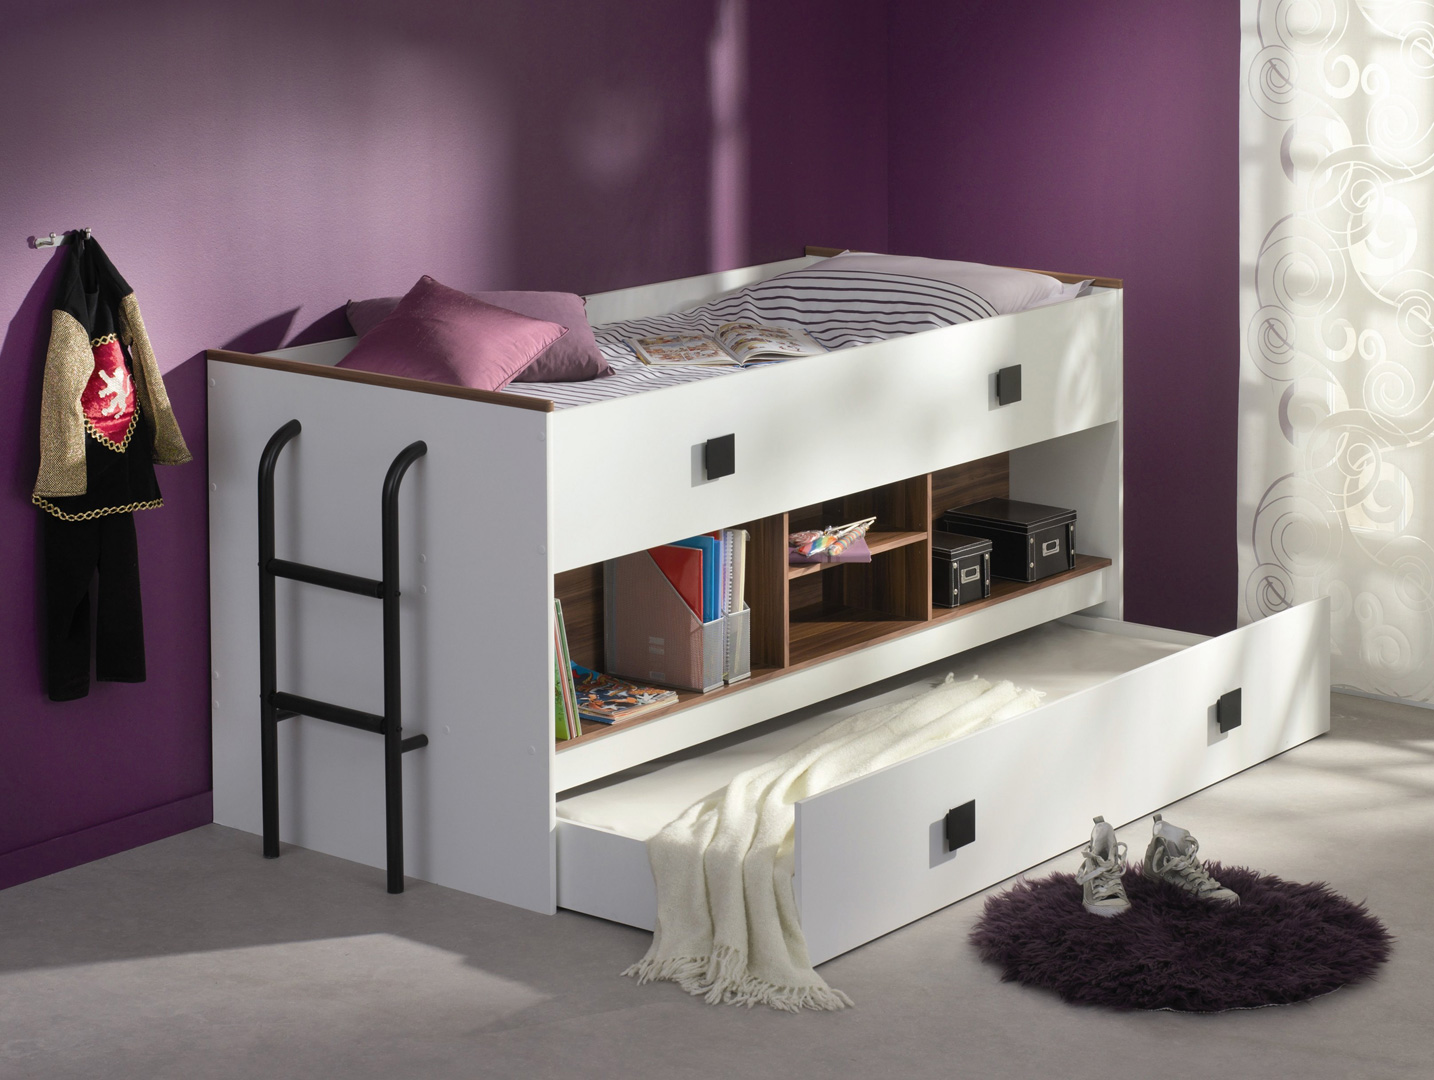 Lit combiné avec tiroir lit BIBOP